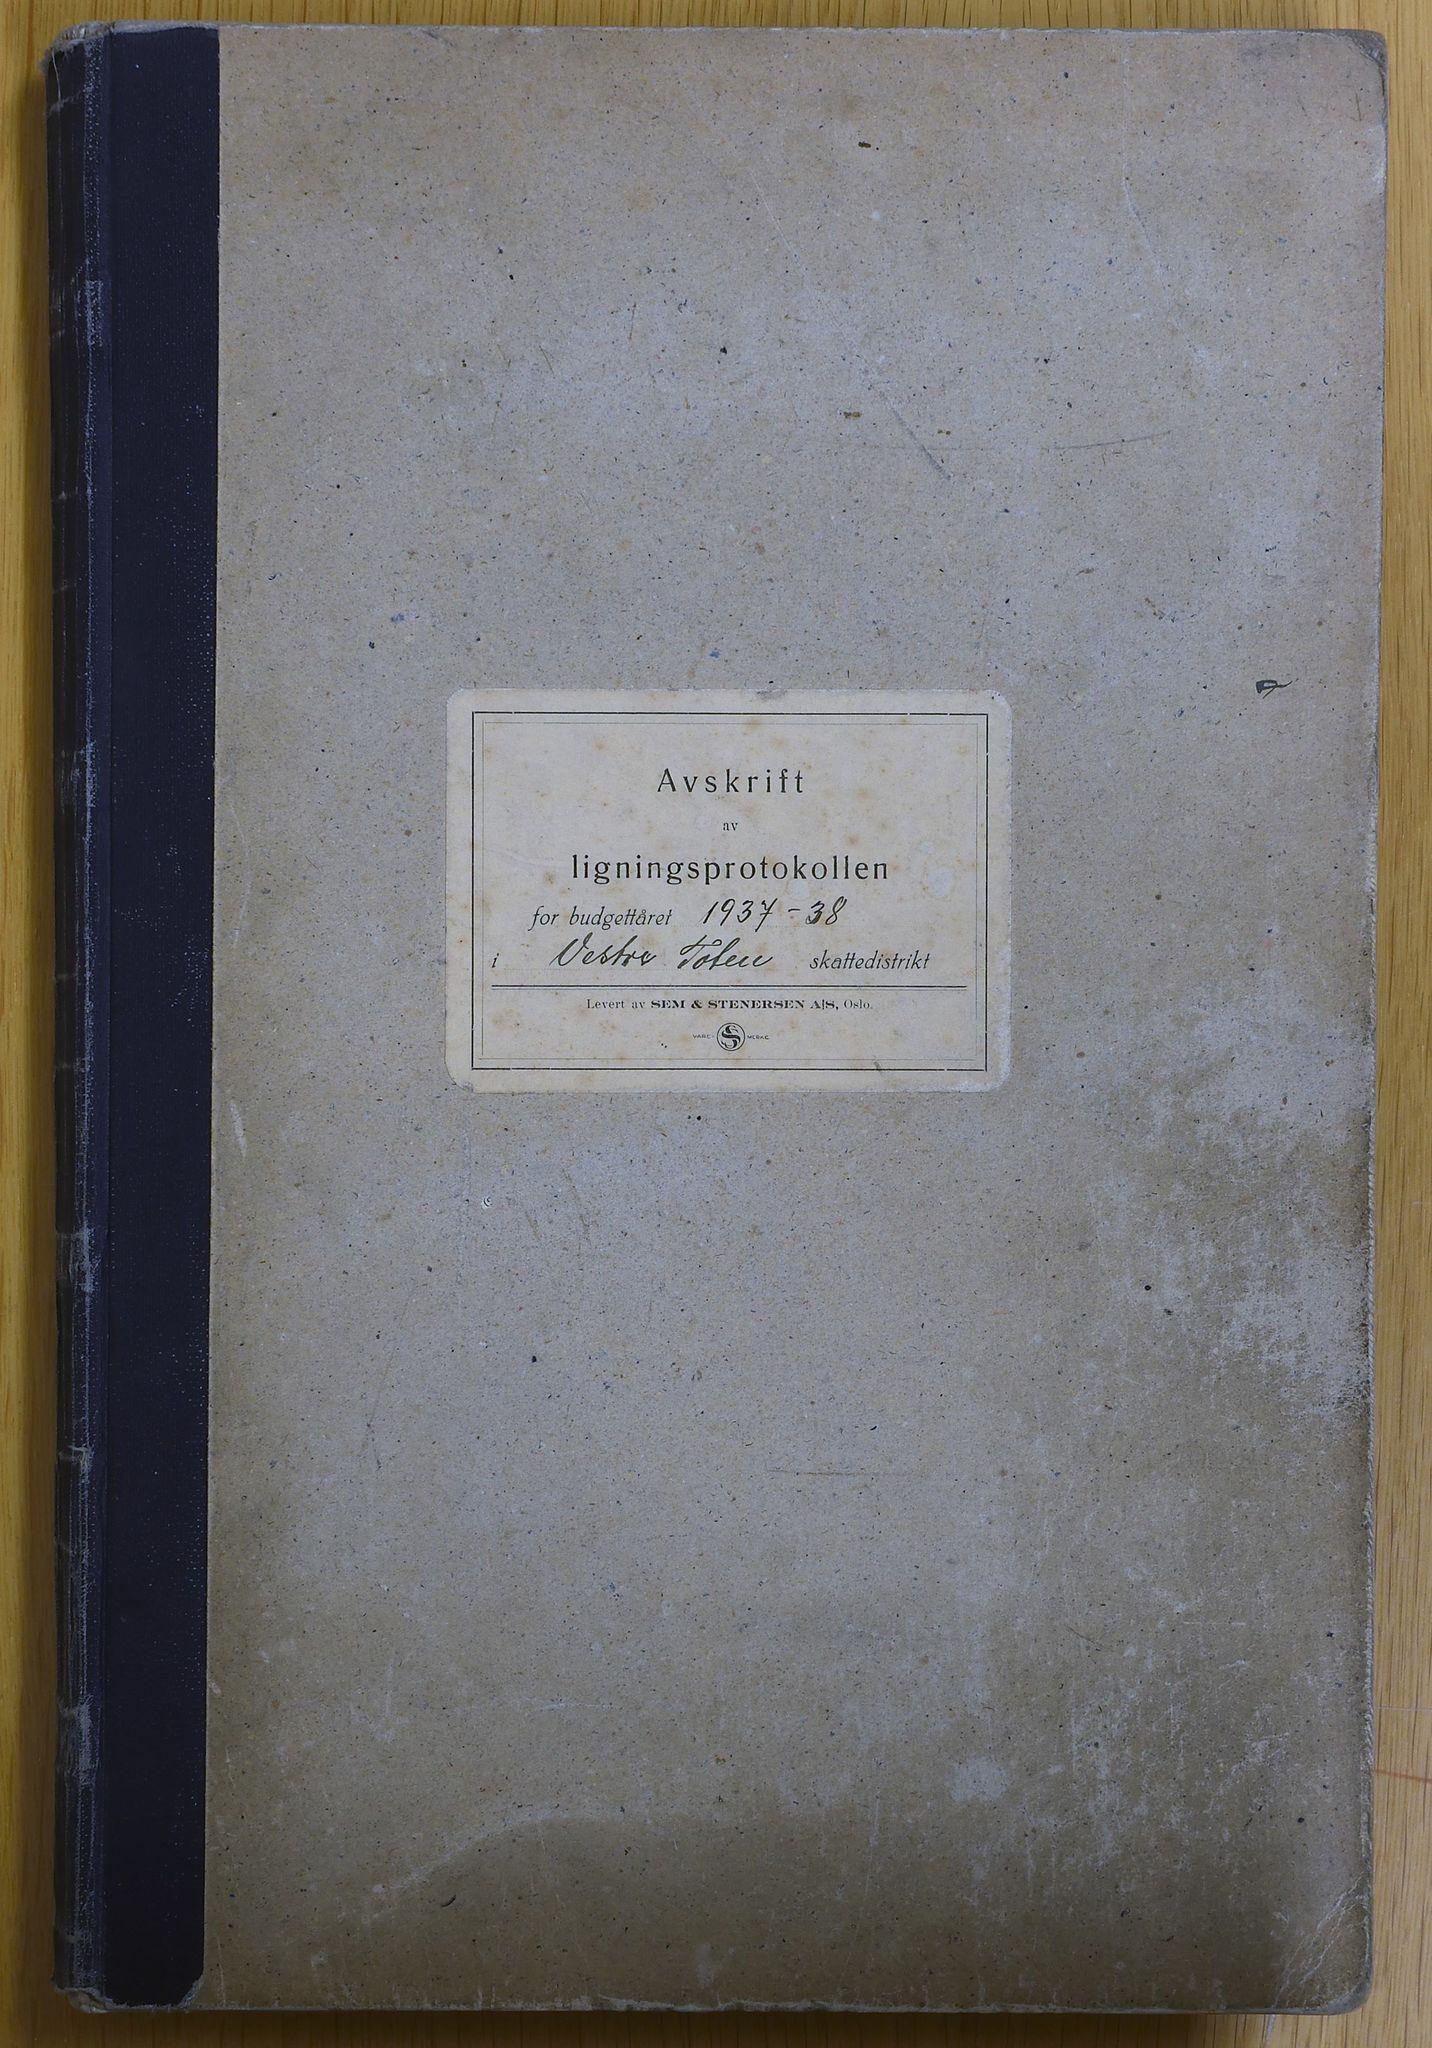 KVT, Vestre Toten municipality archive – Vestre Toten, Tax assessment protocol 1937-1938, 1937-1938